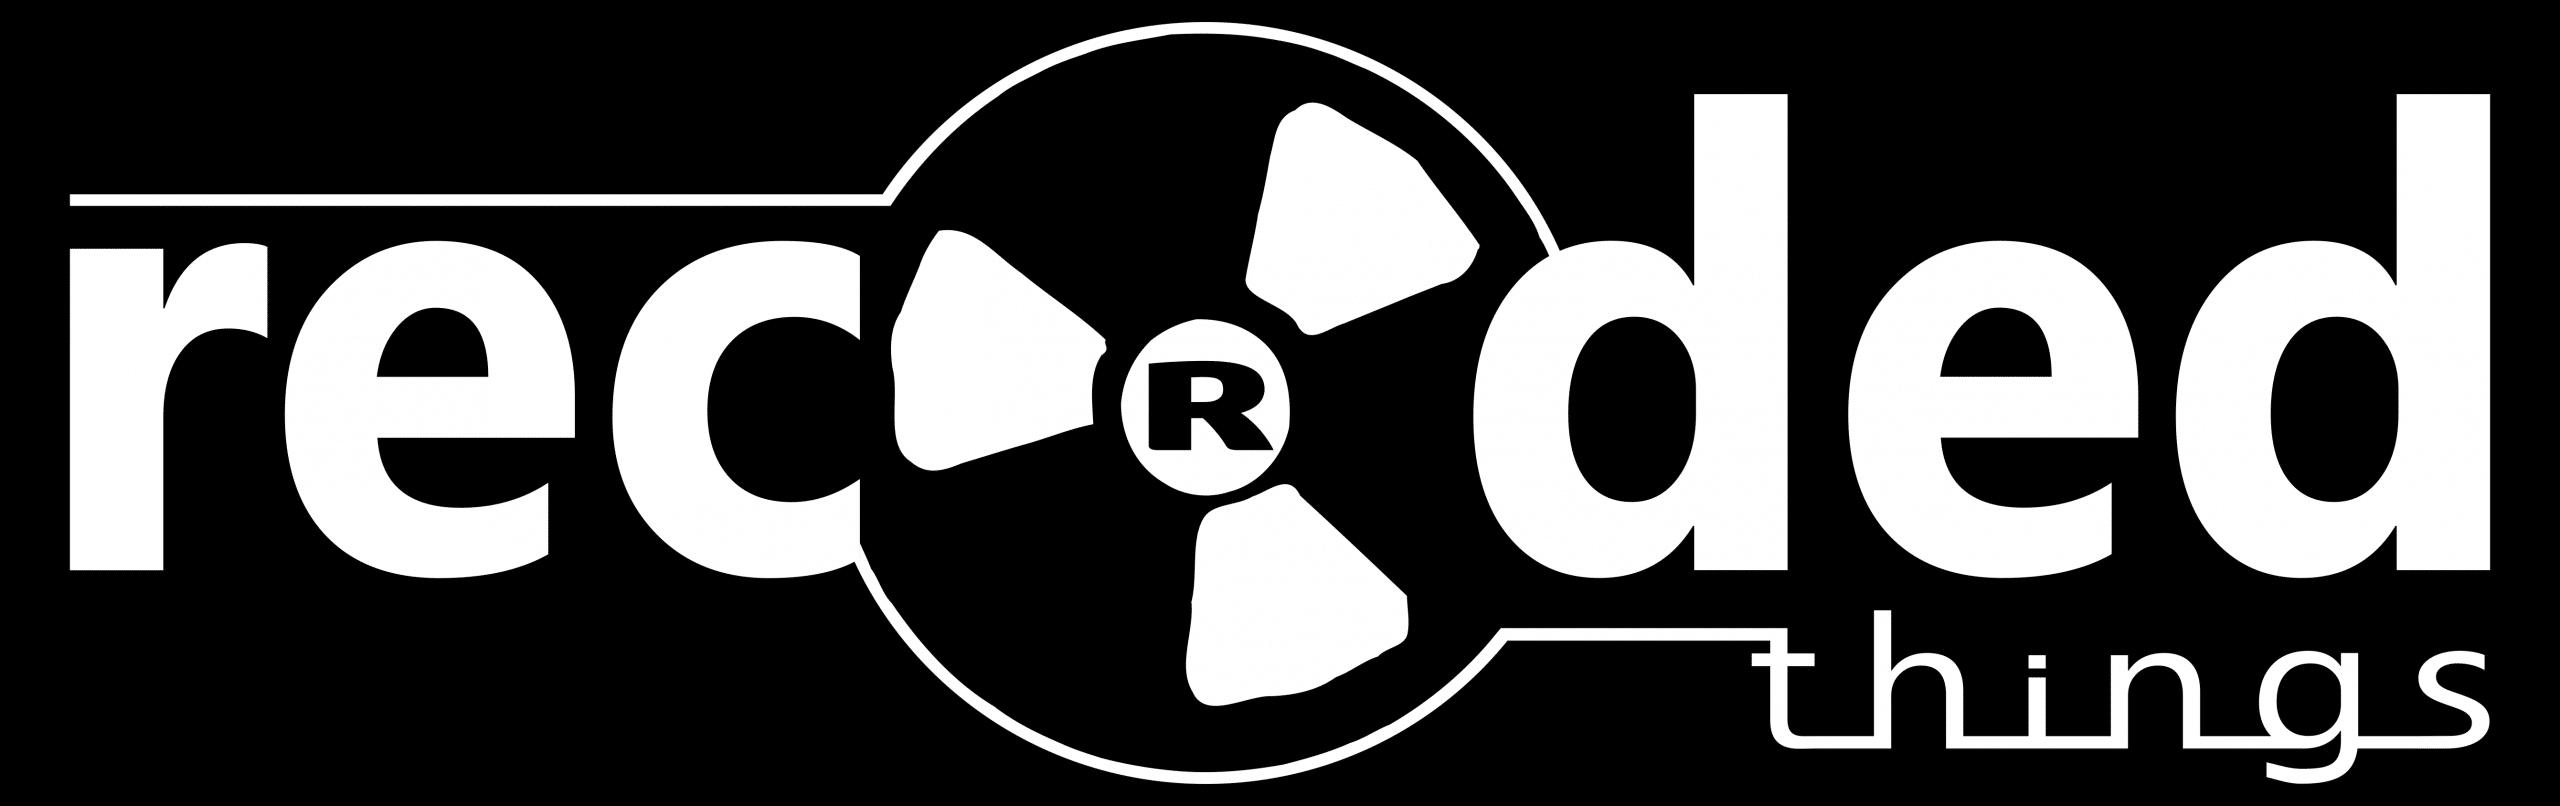 Oliver Rosemann - Recorded Things